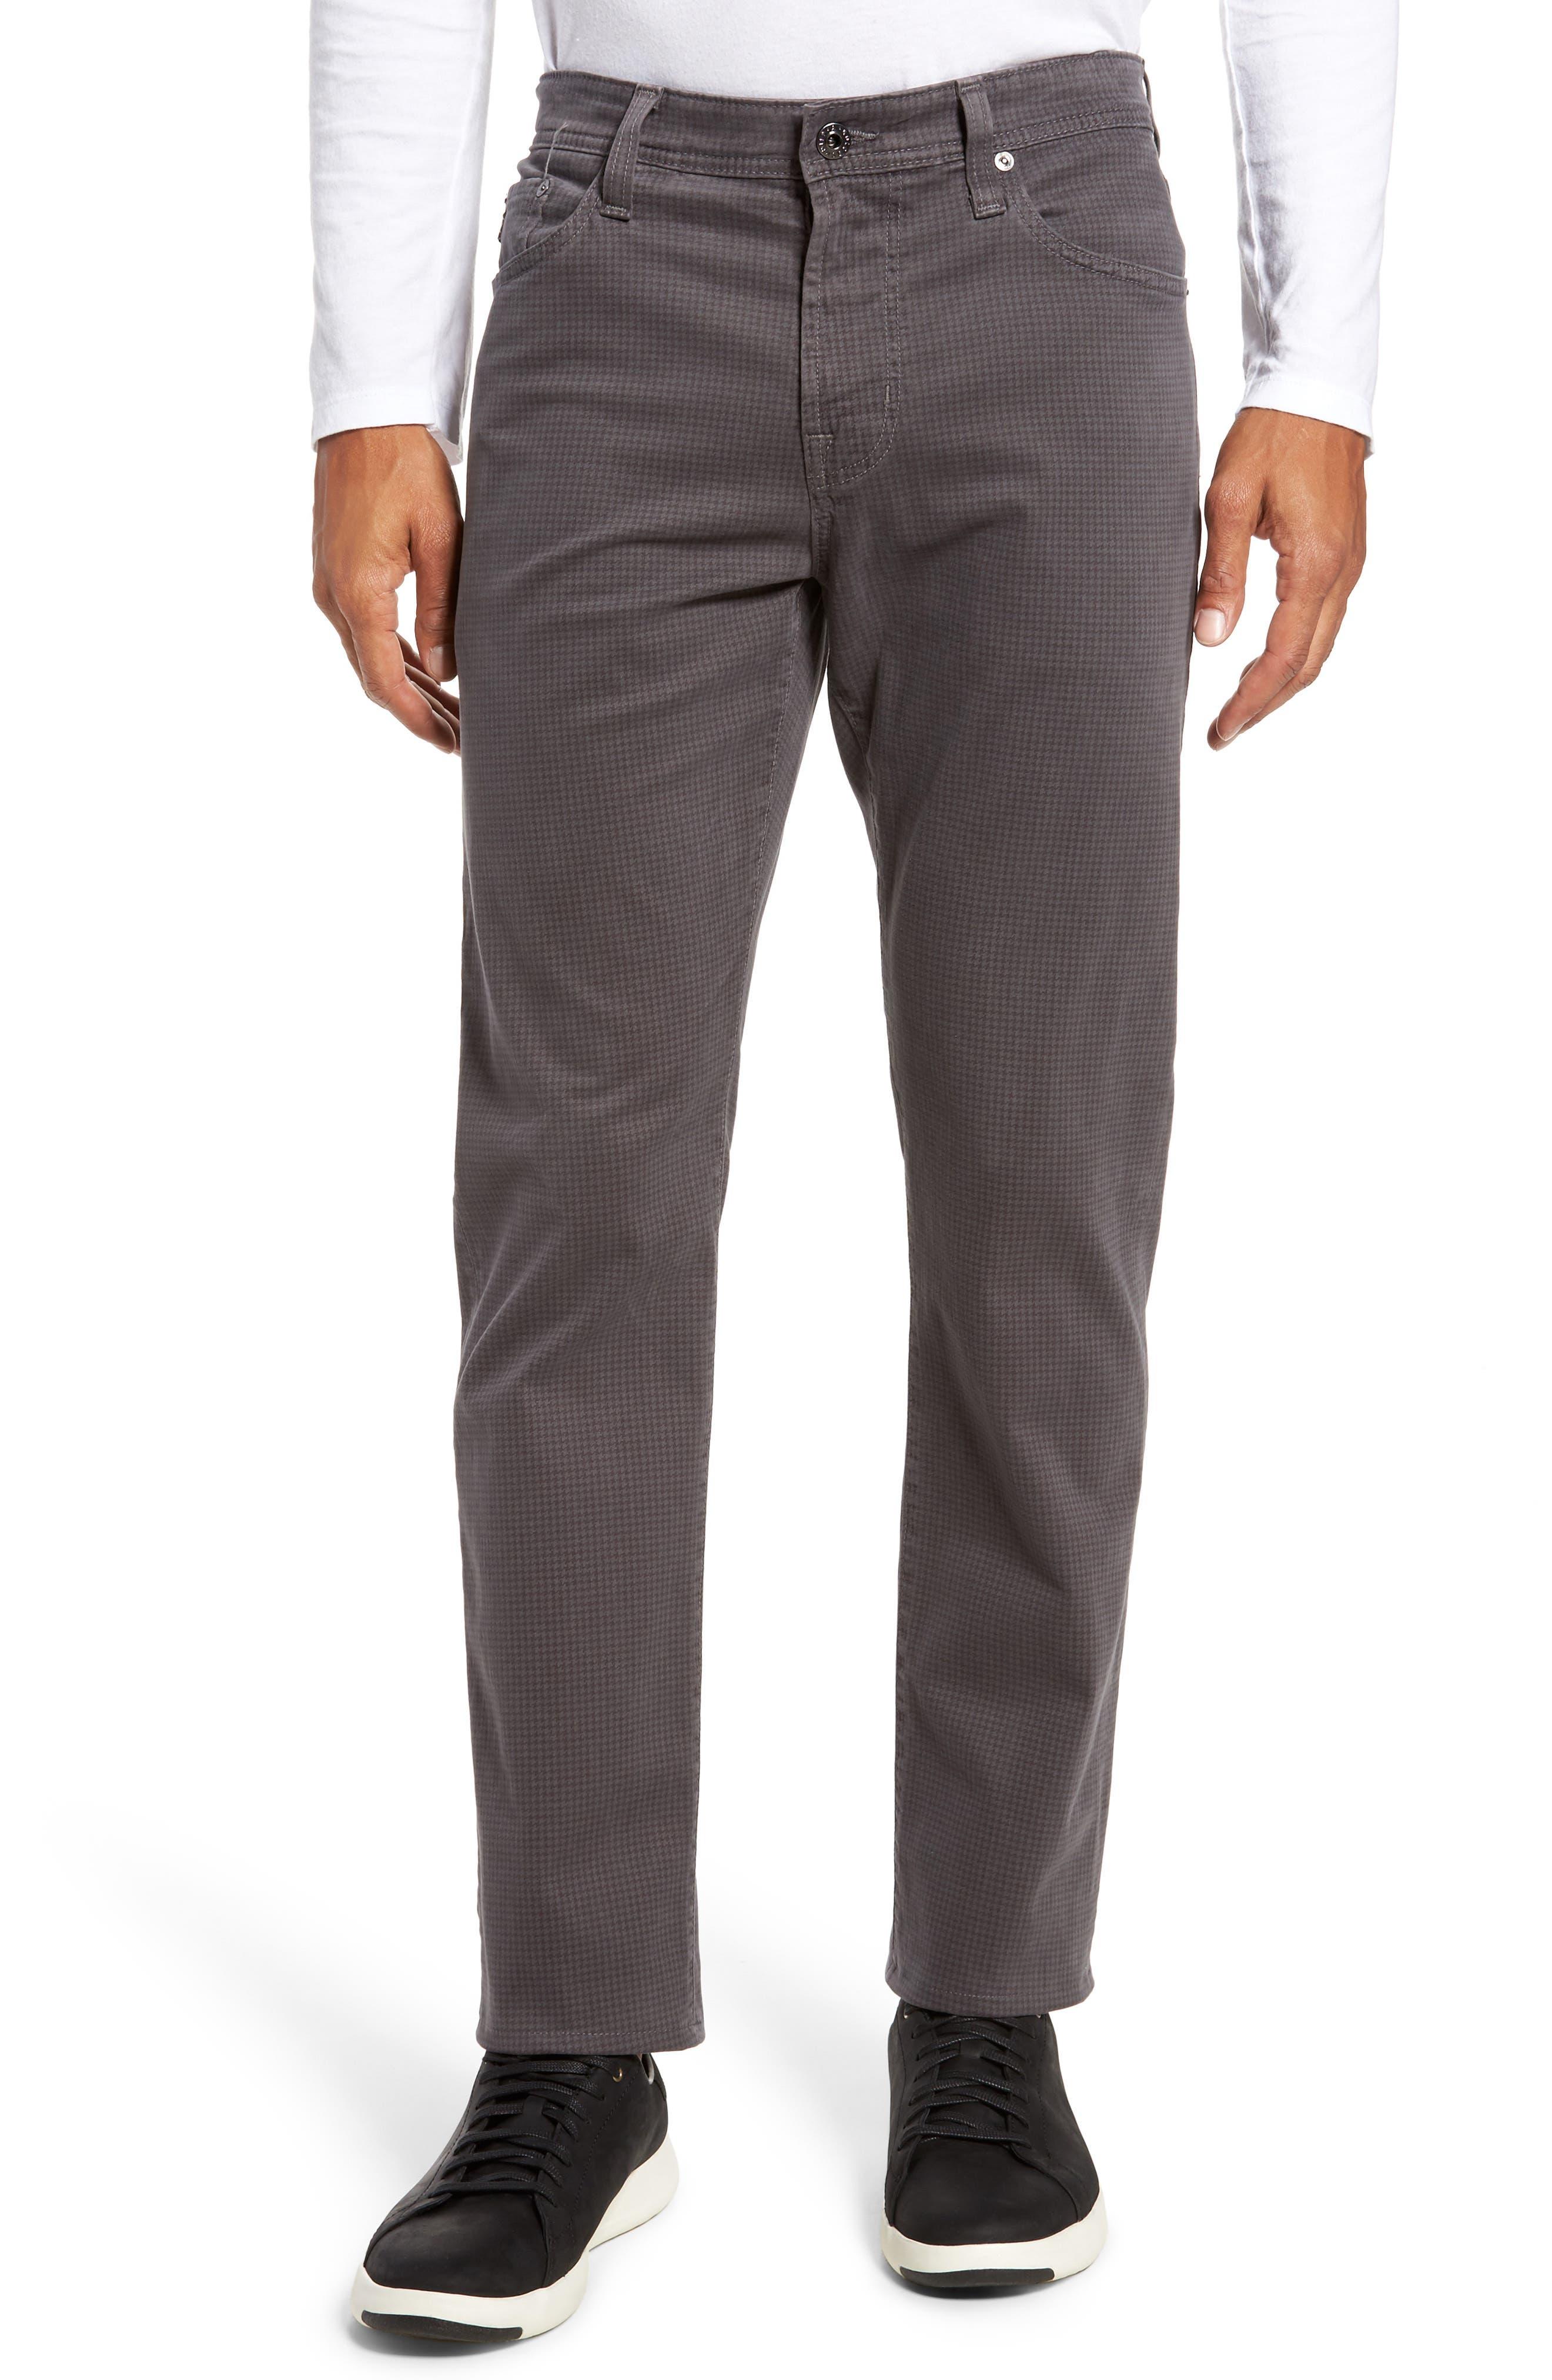 AG, Everett SUD Print Slim Straight Leg Pants, Main thumbnail 1, color, NO_COLOR